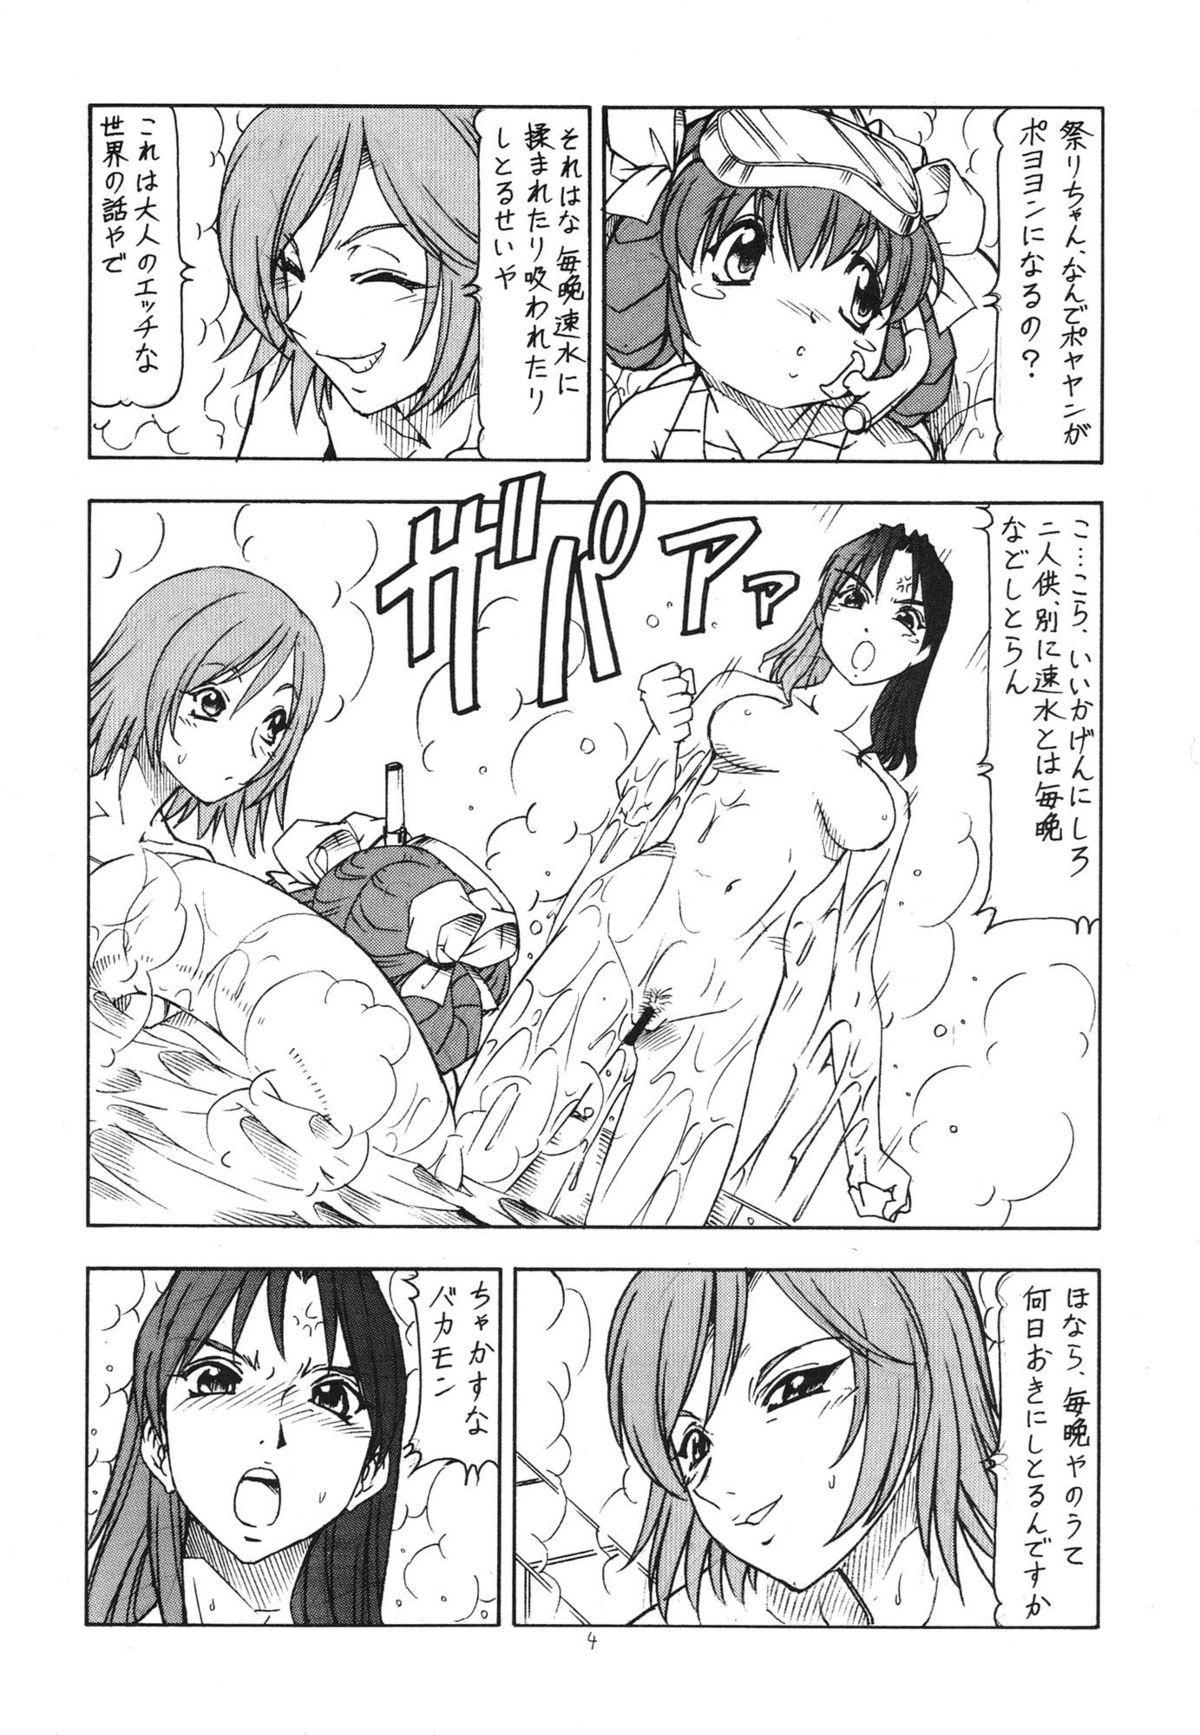 GPM.XXX Animation Moegiiro no Namida - Tear Drops 5